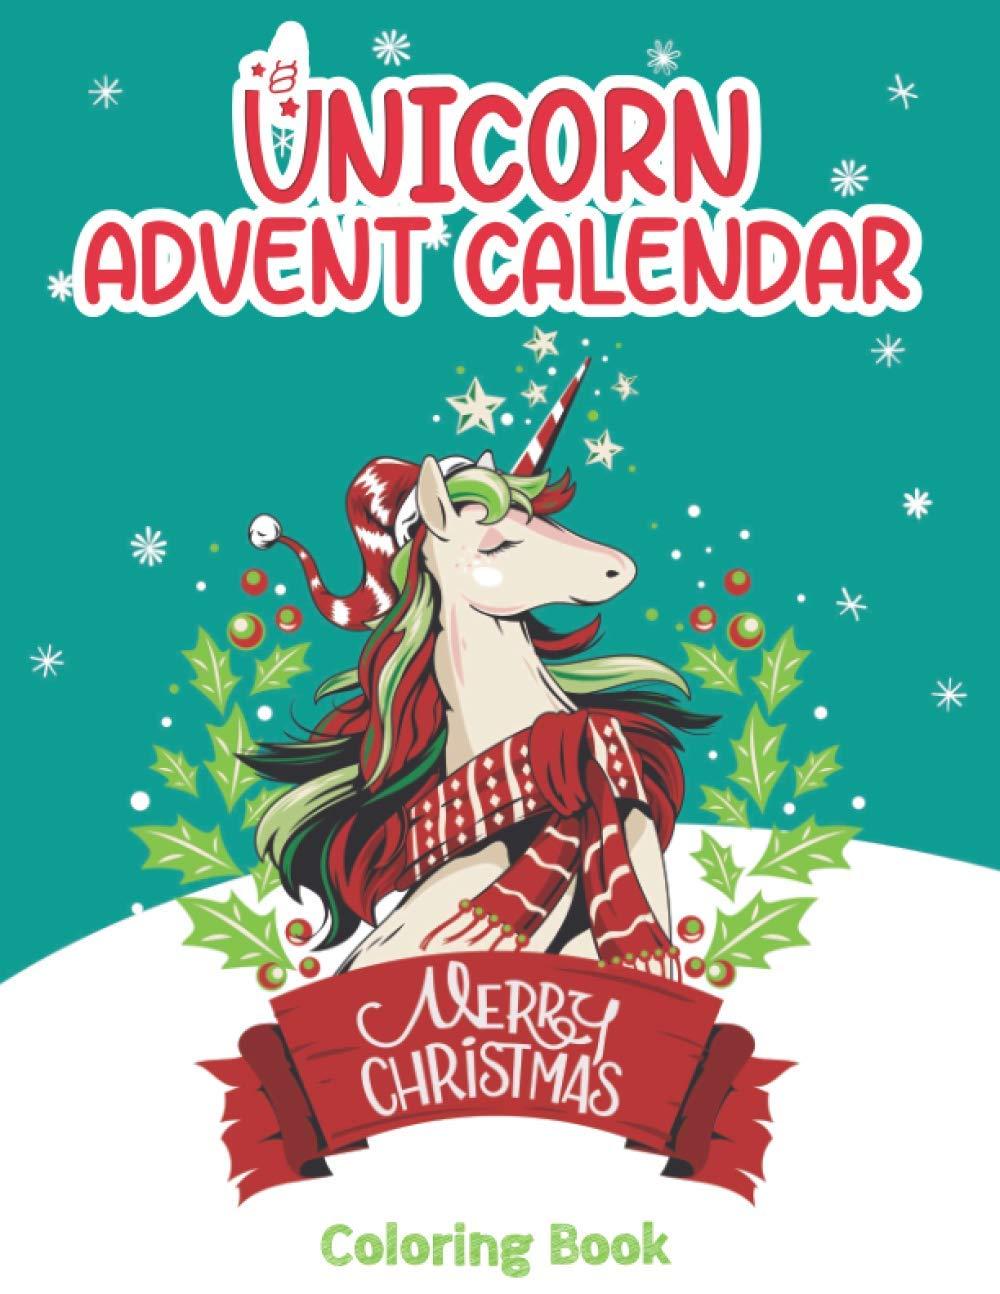 Unicorn Advent Calendar Coloring Book